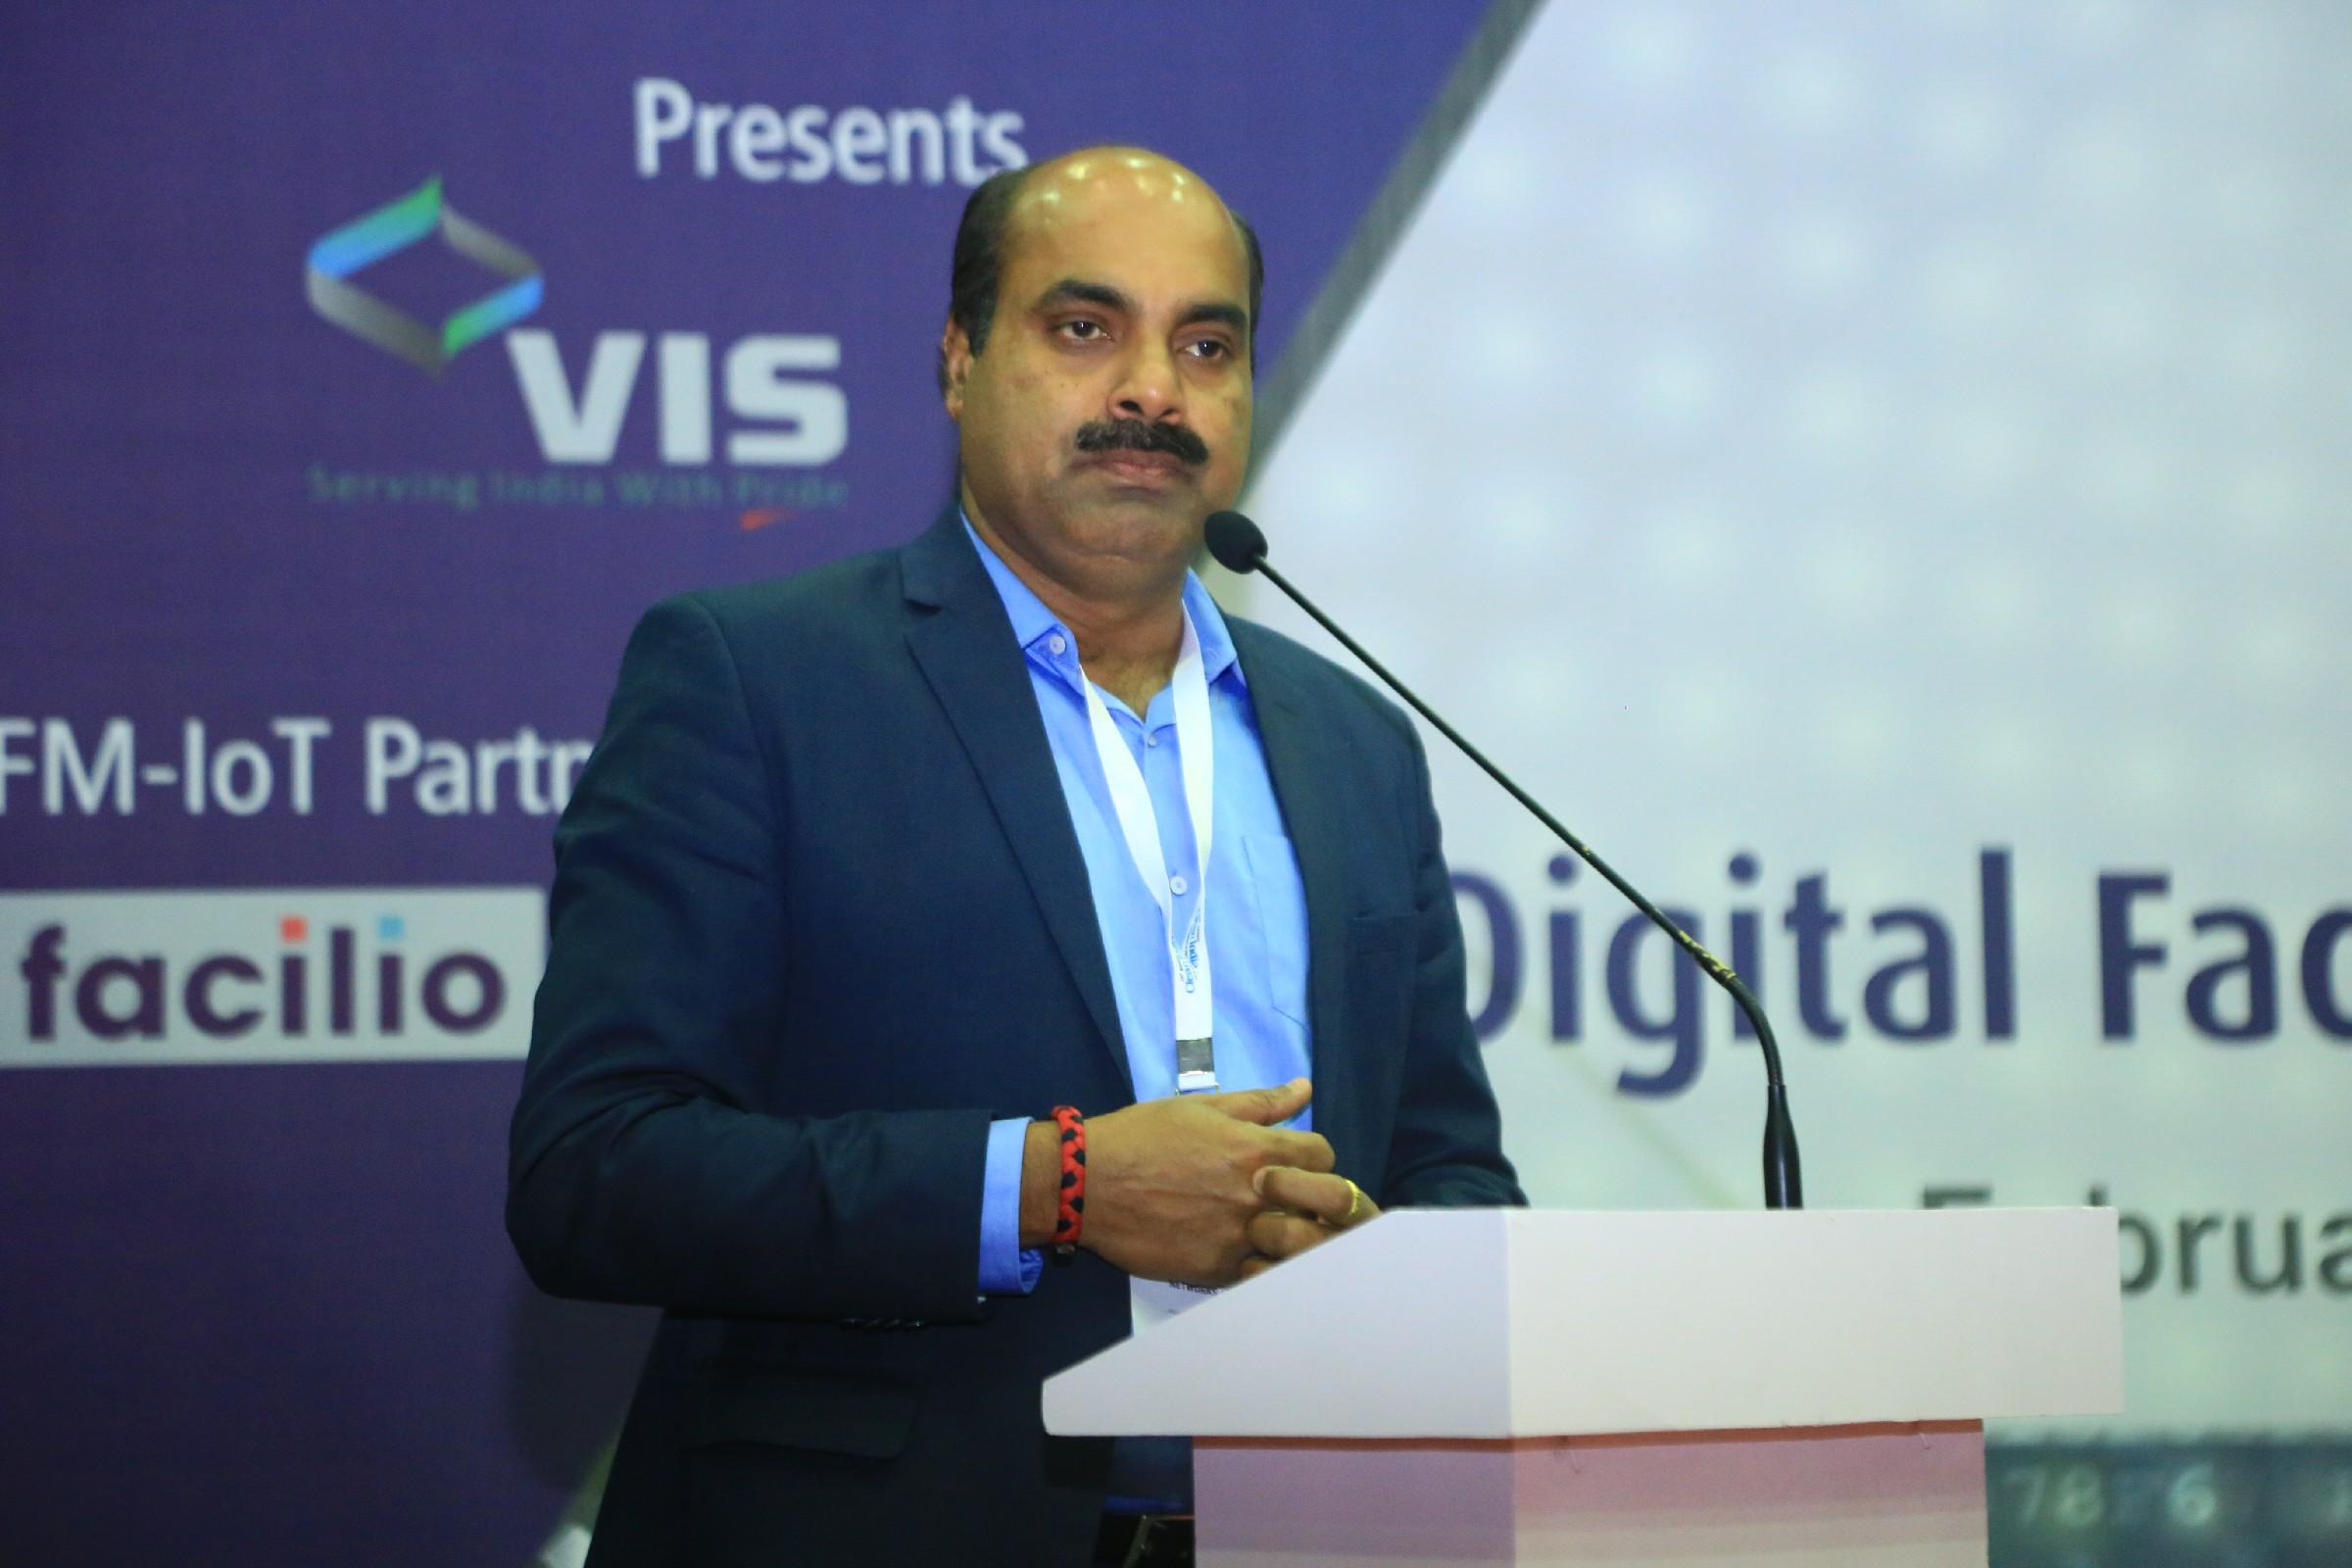 Jayantha-Prabhu-Group-CIO-Essar-Group-Head-India-SAARC-AGC-Networks-11